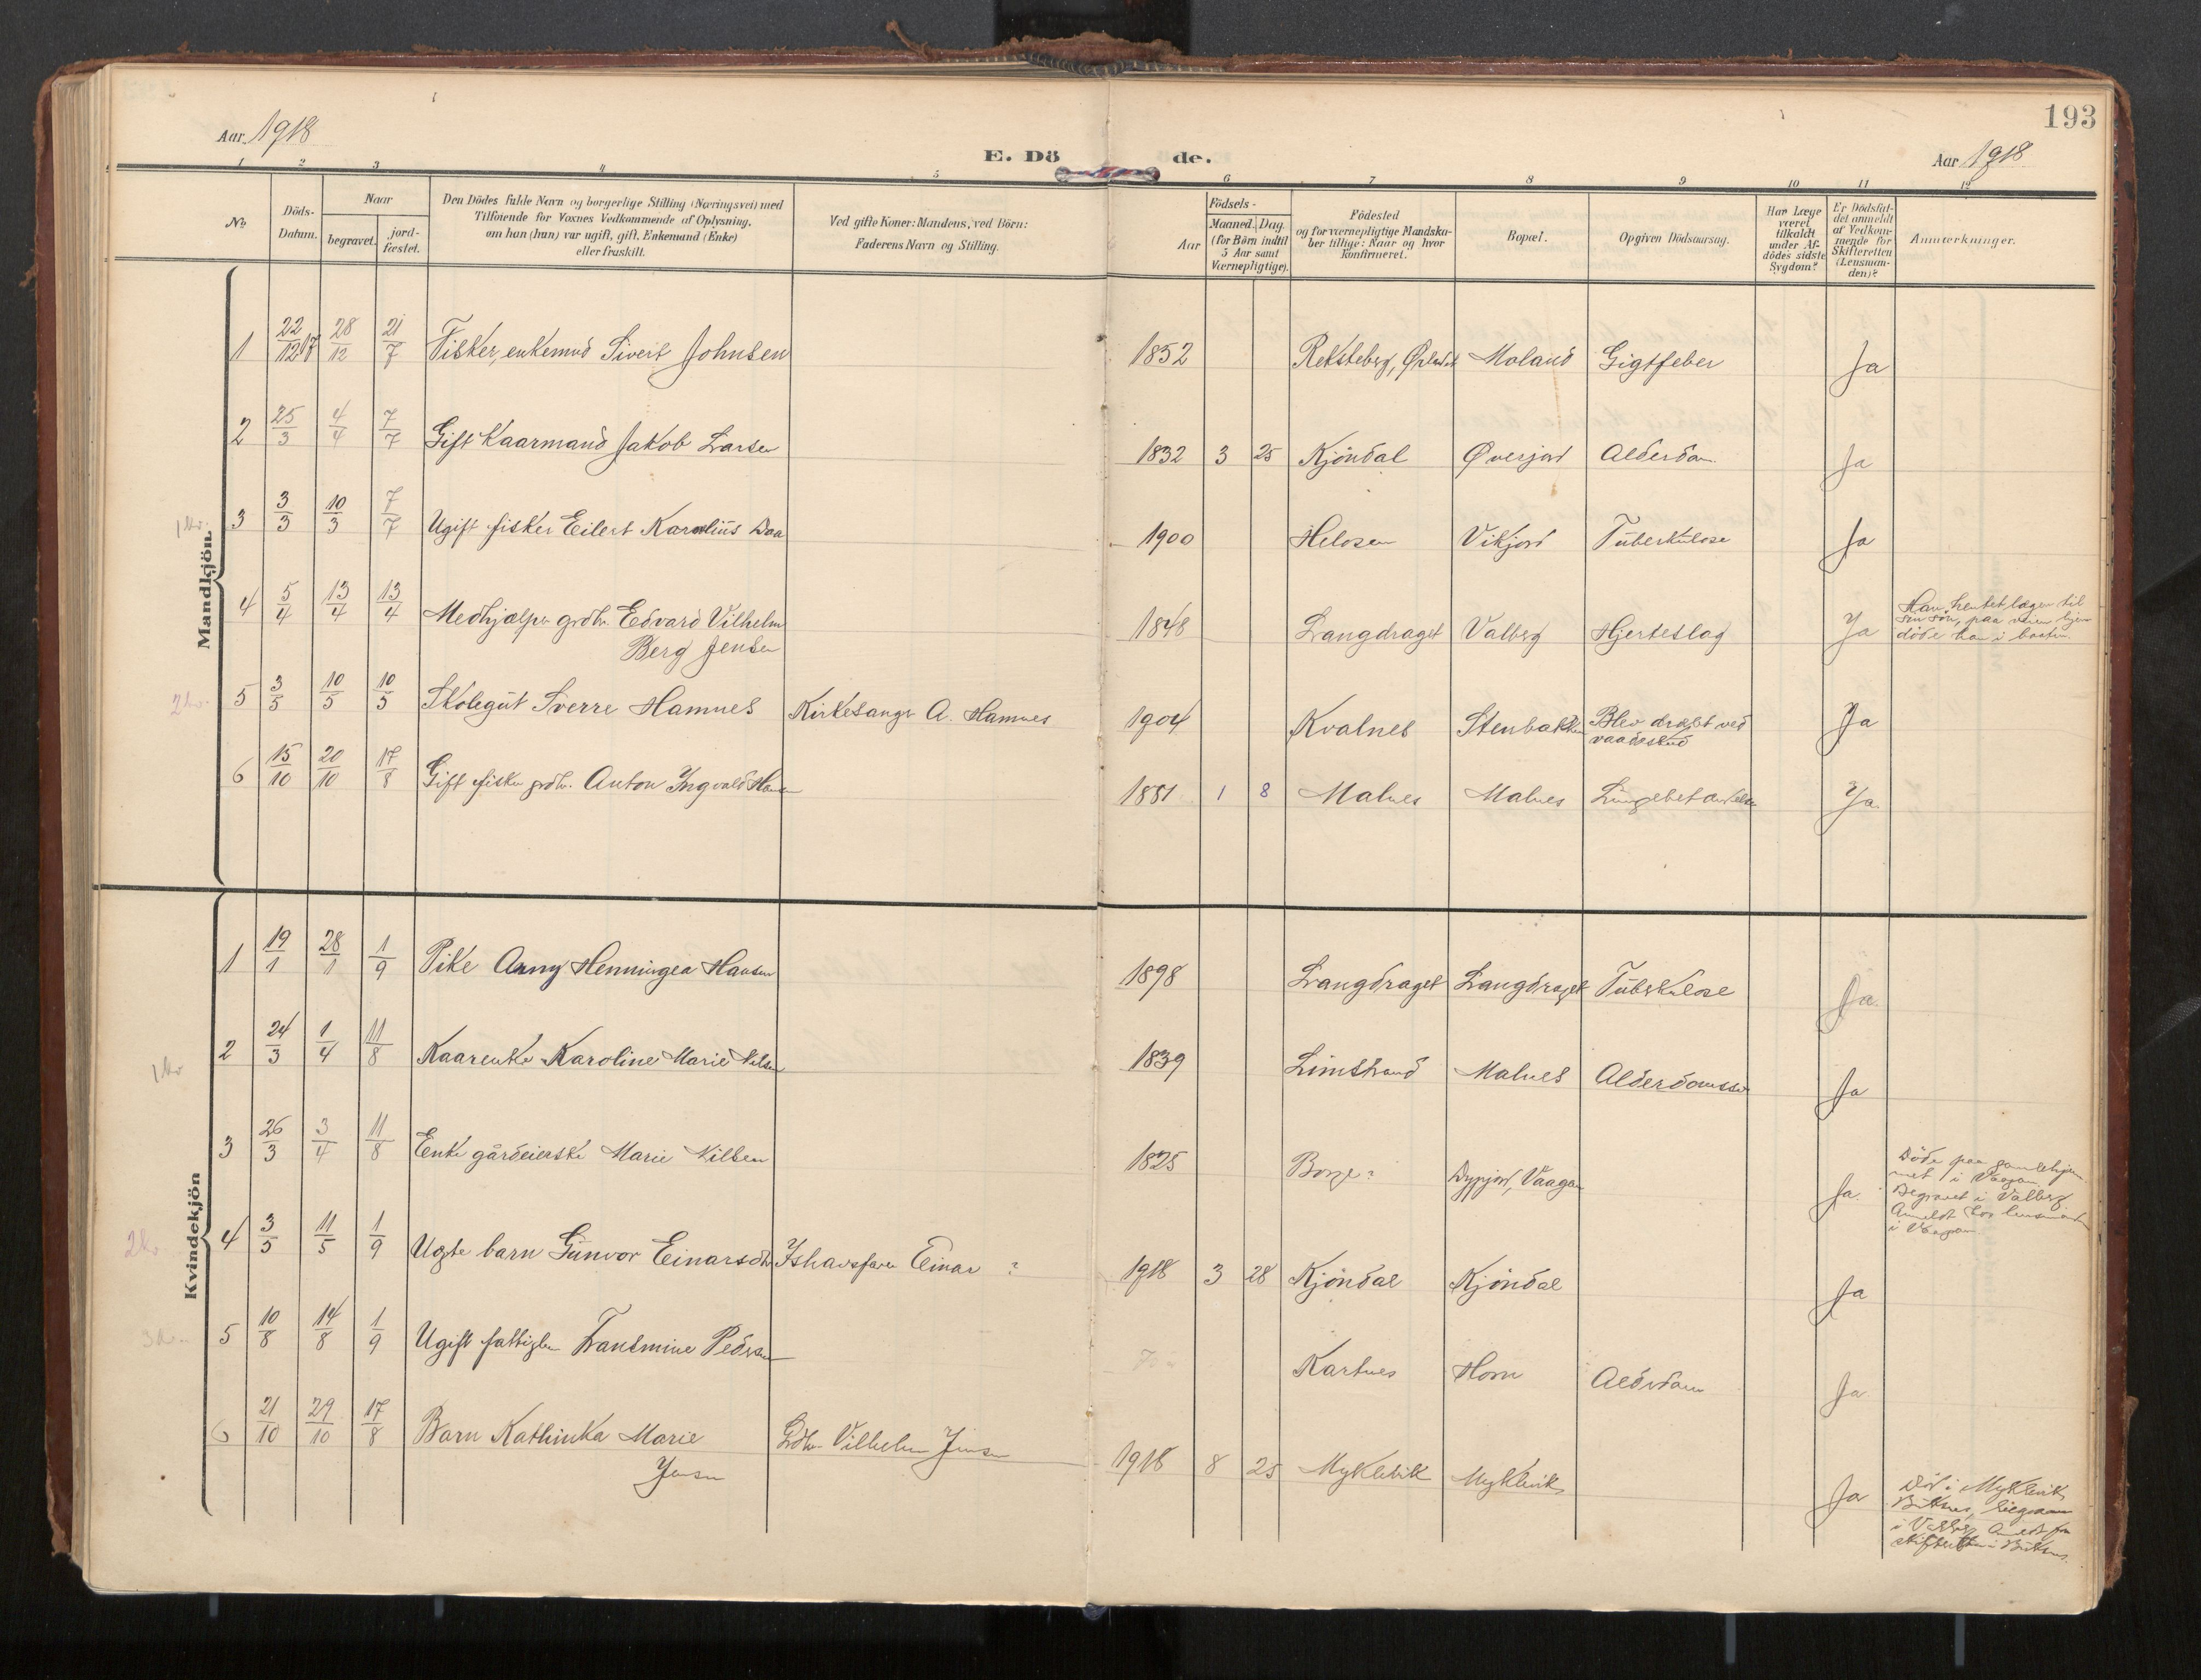 SAT, Ministerialprotokoller, klokkerbøker og fødselsregistre - Nordland, 884/L1194: Ministerialbok nr. 884A02, 1906-1937, s. 193